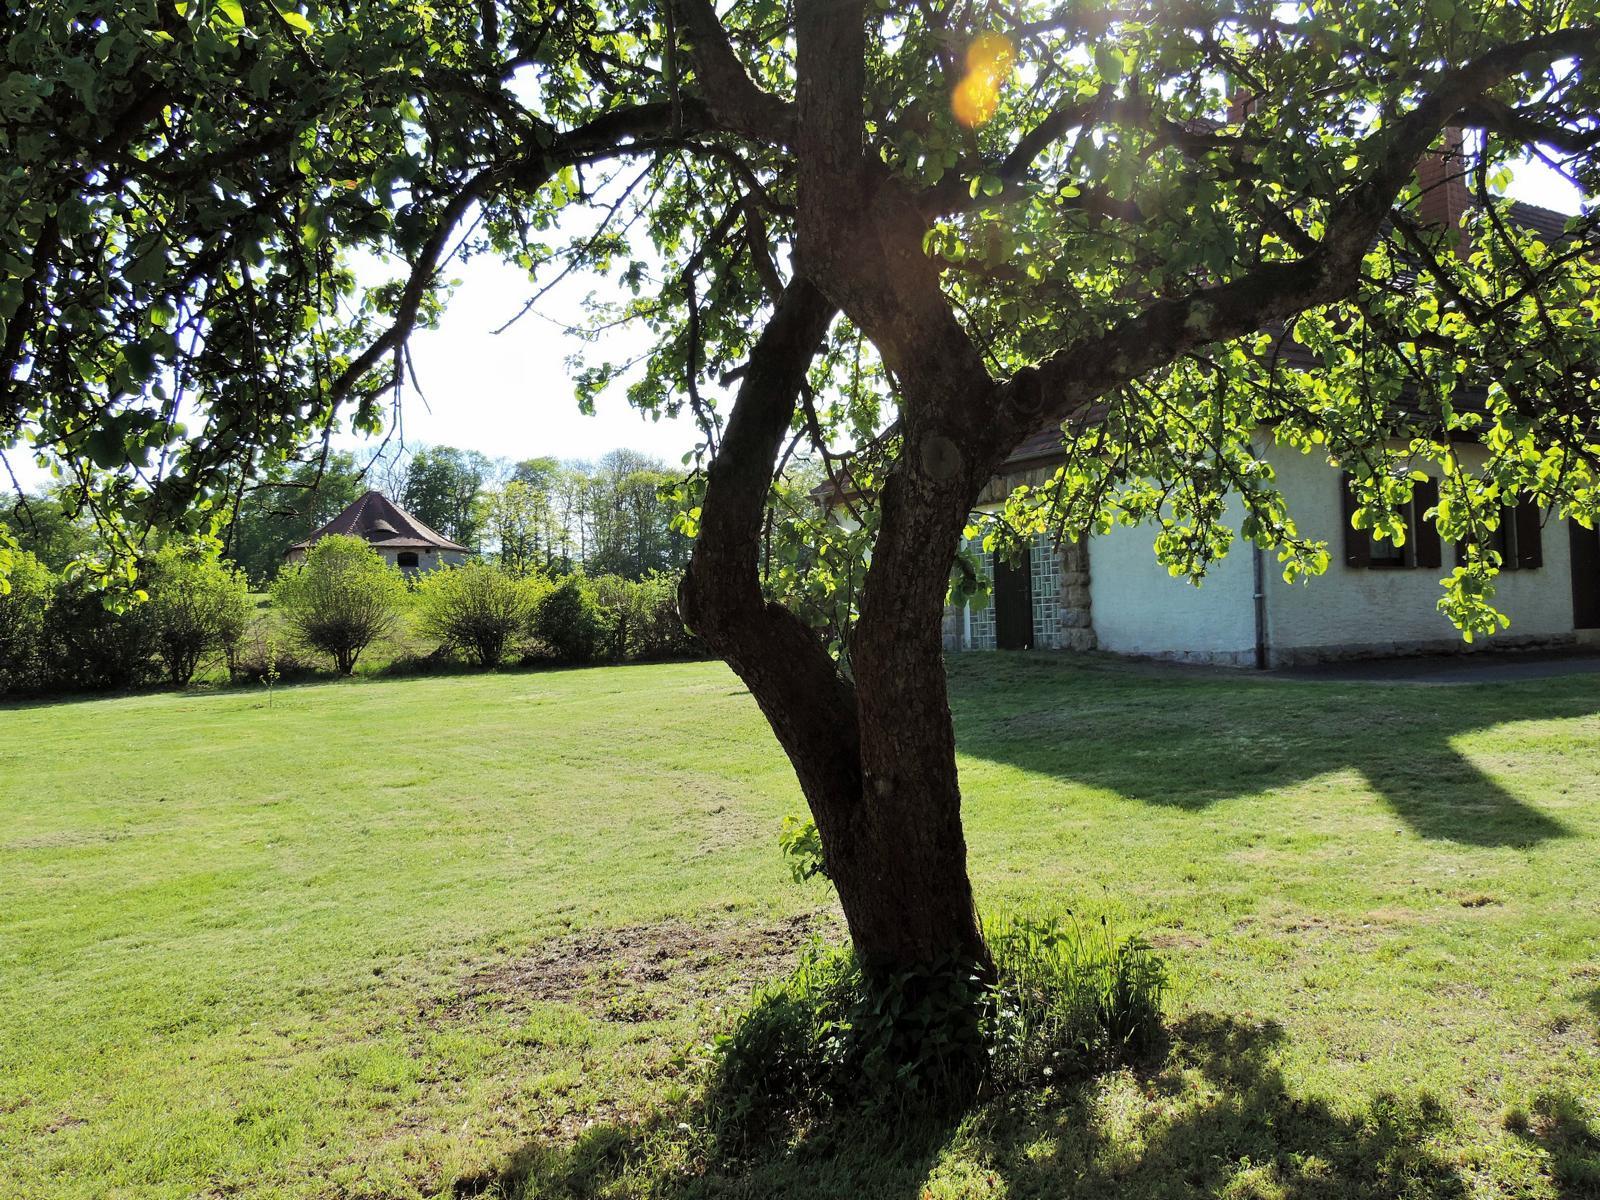 Apfelbaum Blick Richtung Haus Ringgau